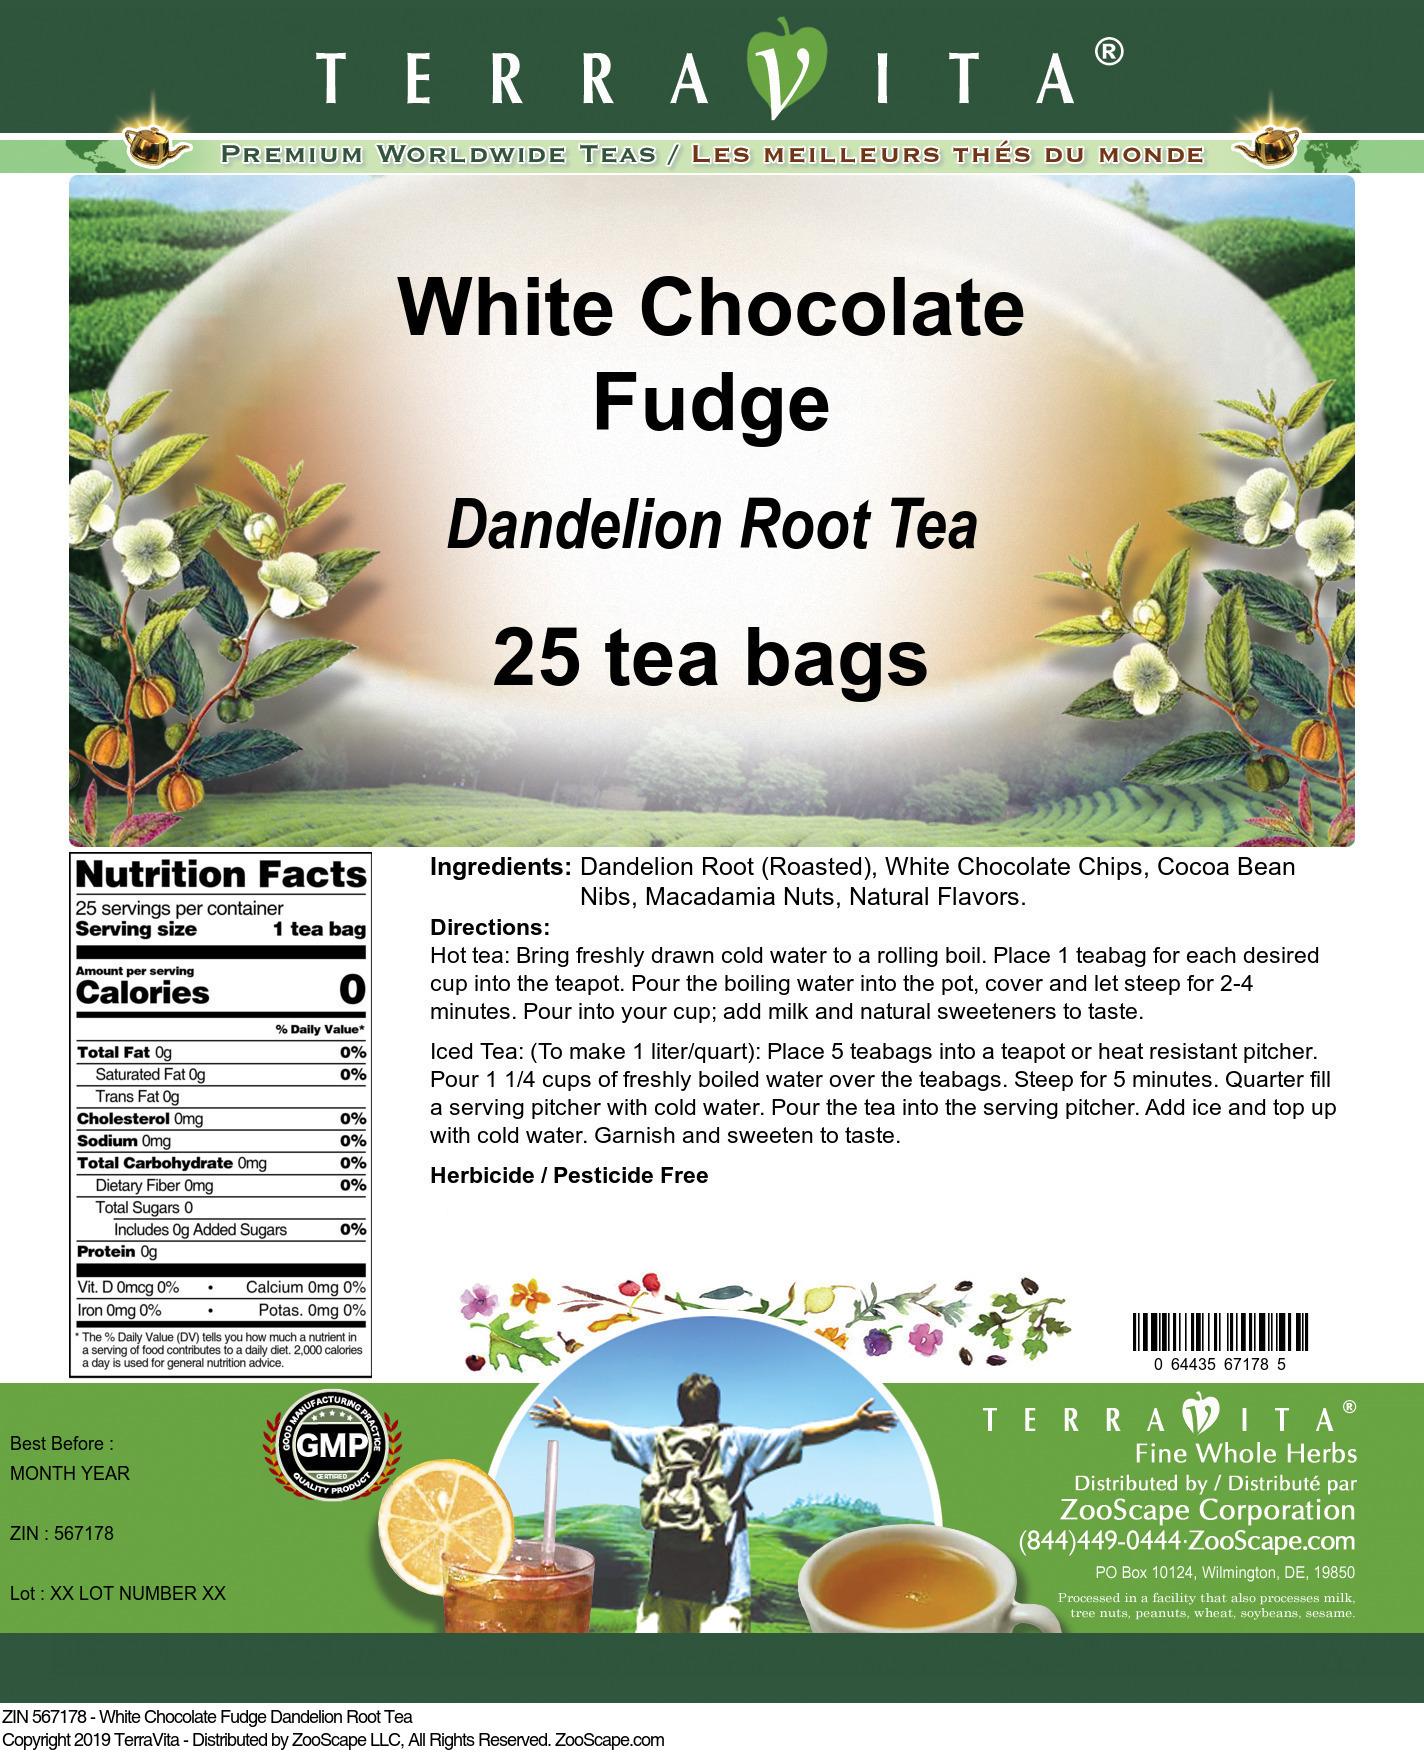 White Chocolate Fudge Dandelion Root